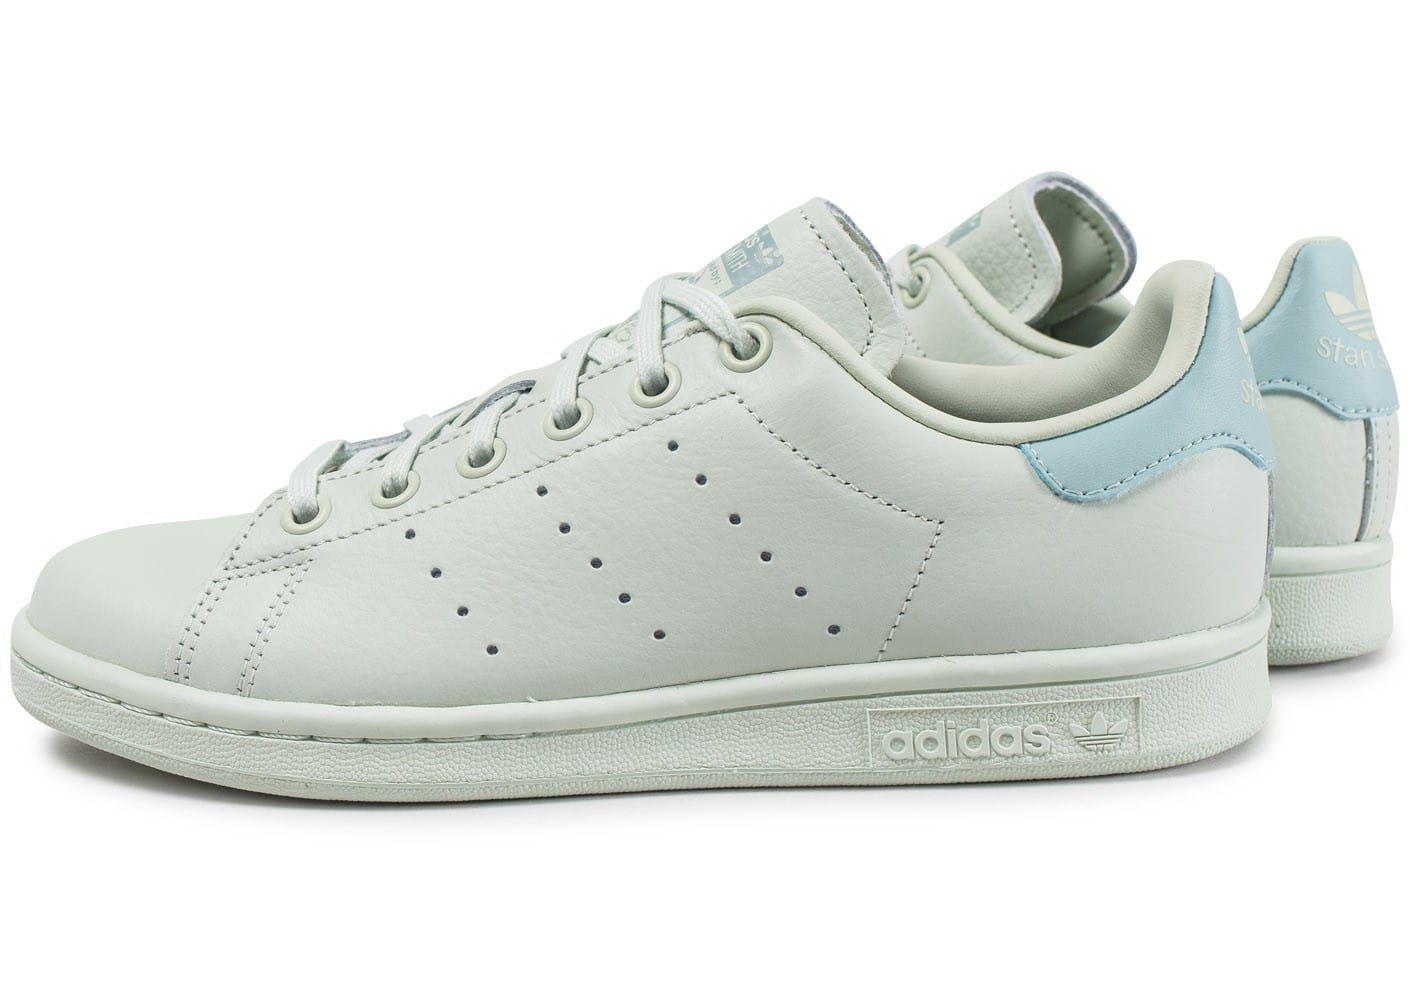 Chaussures adidas Stan Smith Junior vert pastel vue extérieure